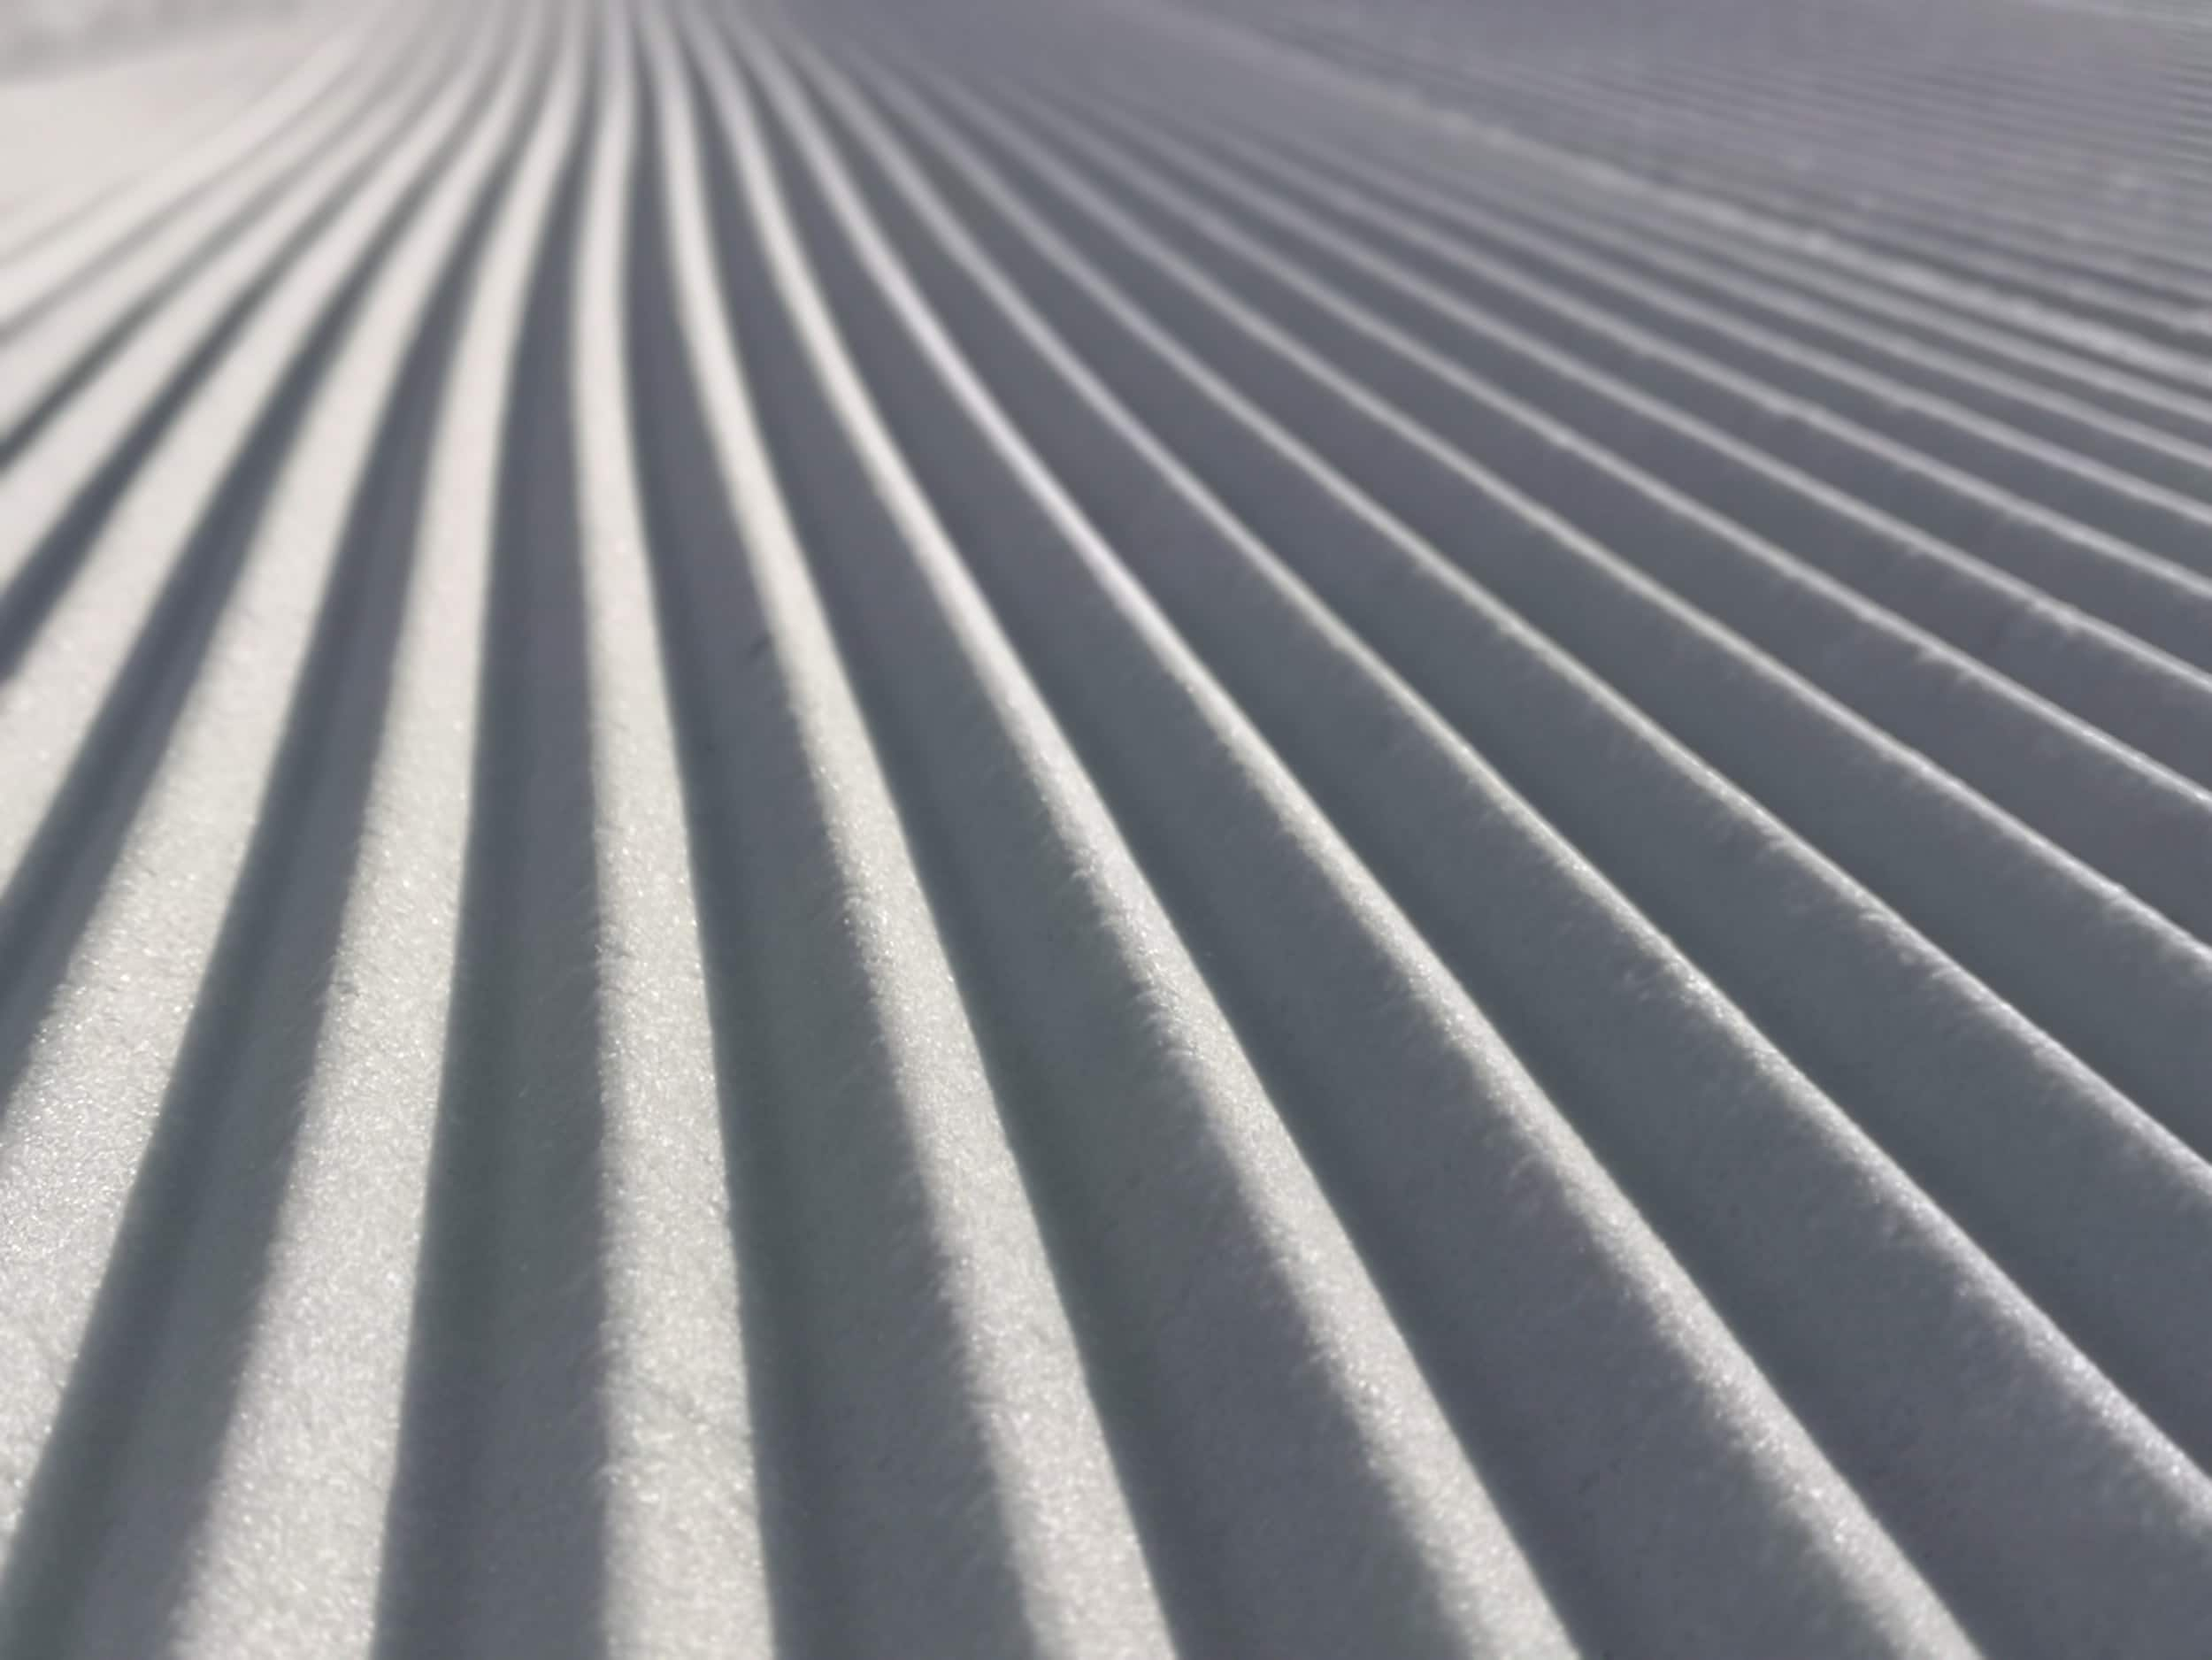 Perfect Pisted Ski Runs Les Gets